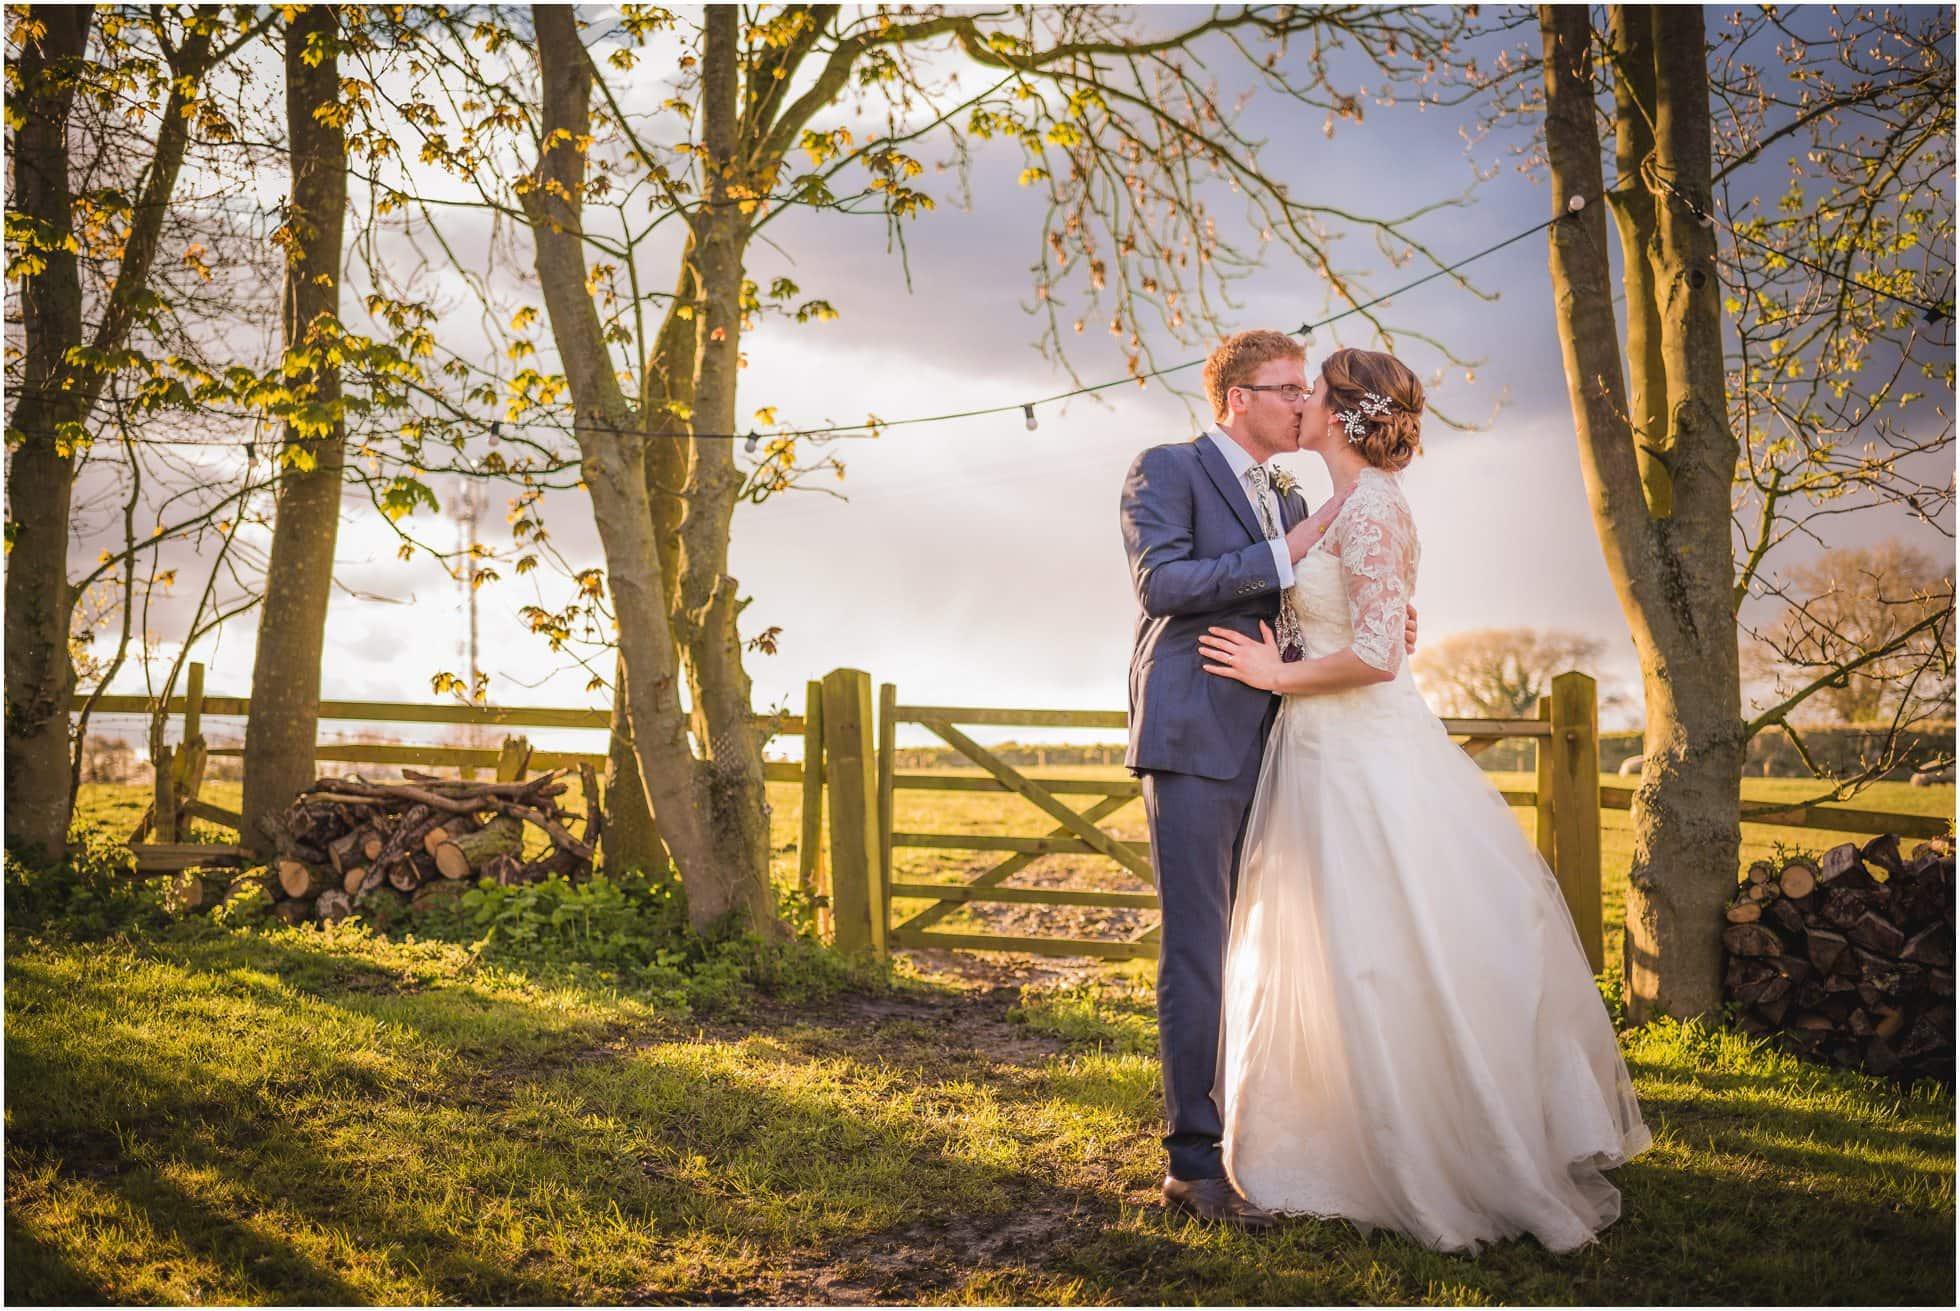 York country wedding informal portraits